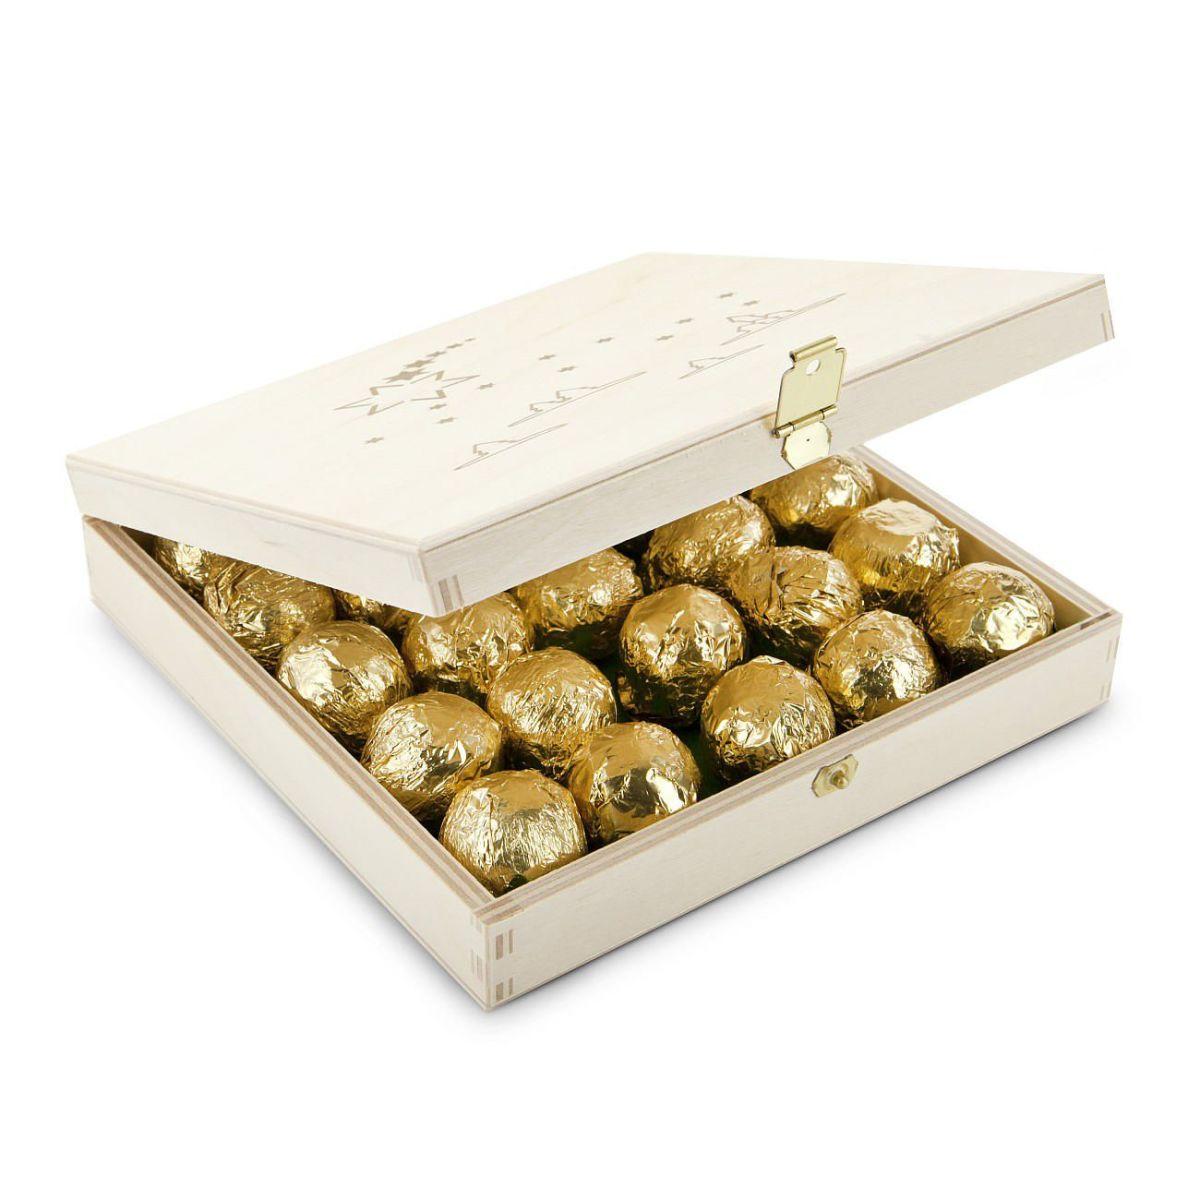 Geschenk-Set Mittlere Trüffel-Kiste, 25 Stück Marc de Champagne ...